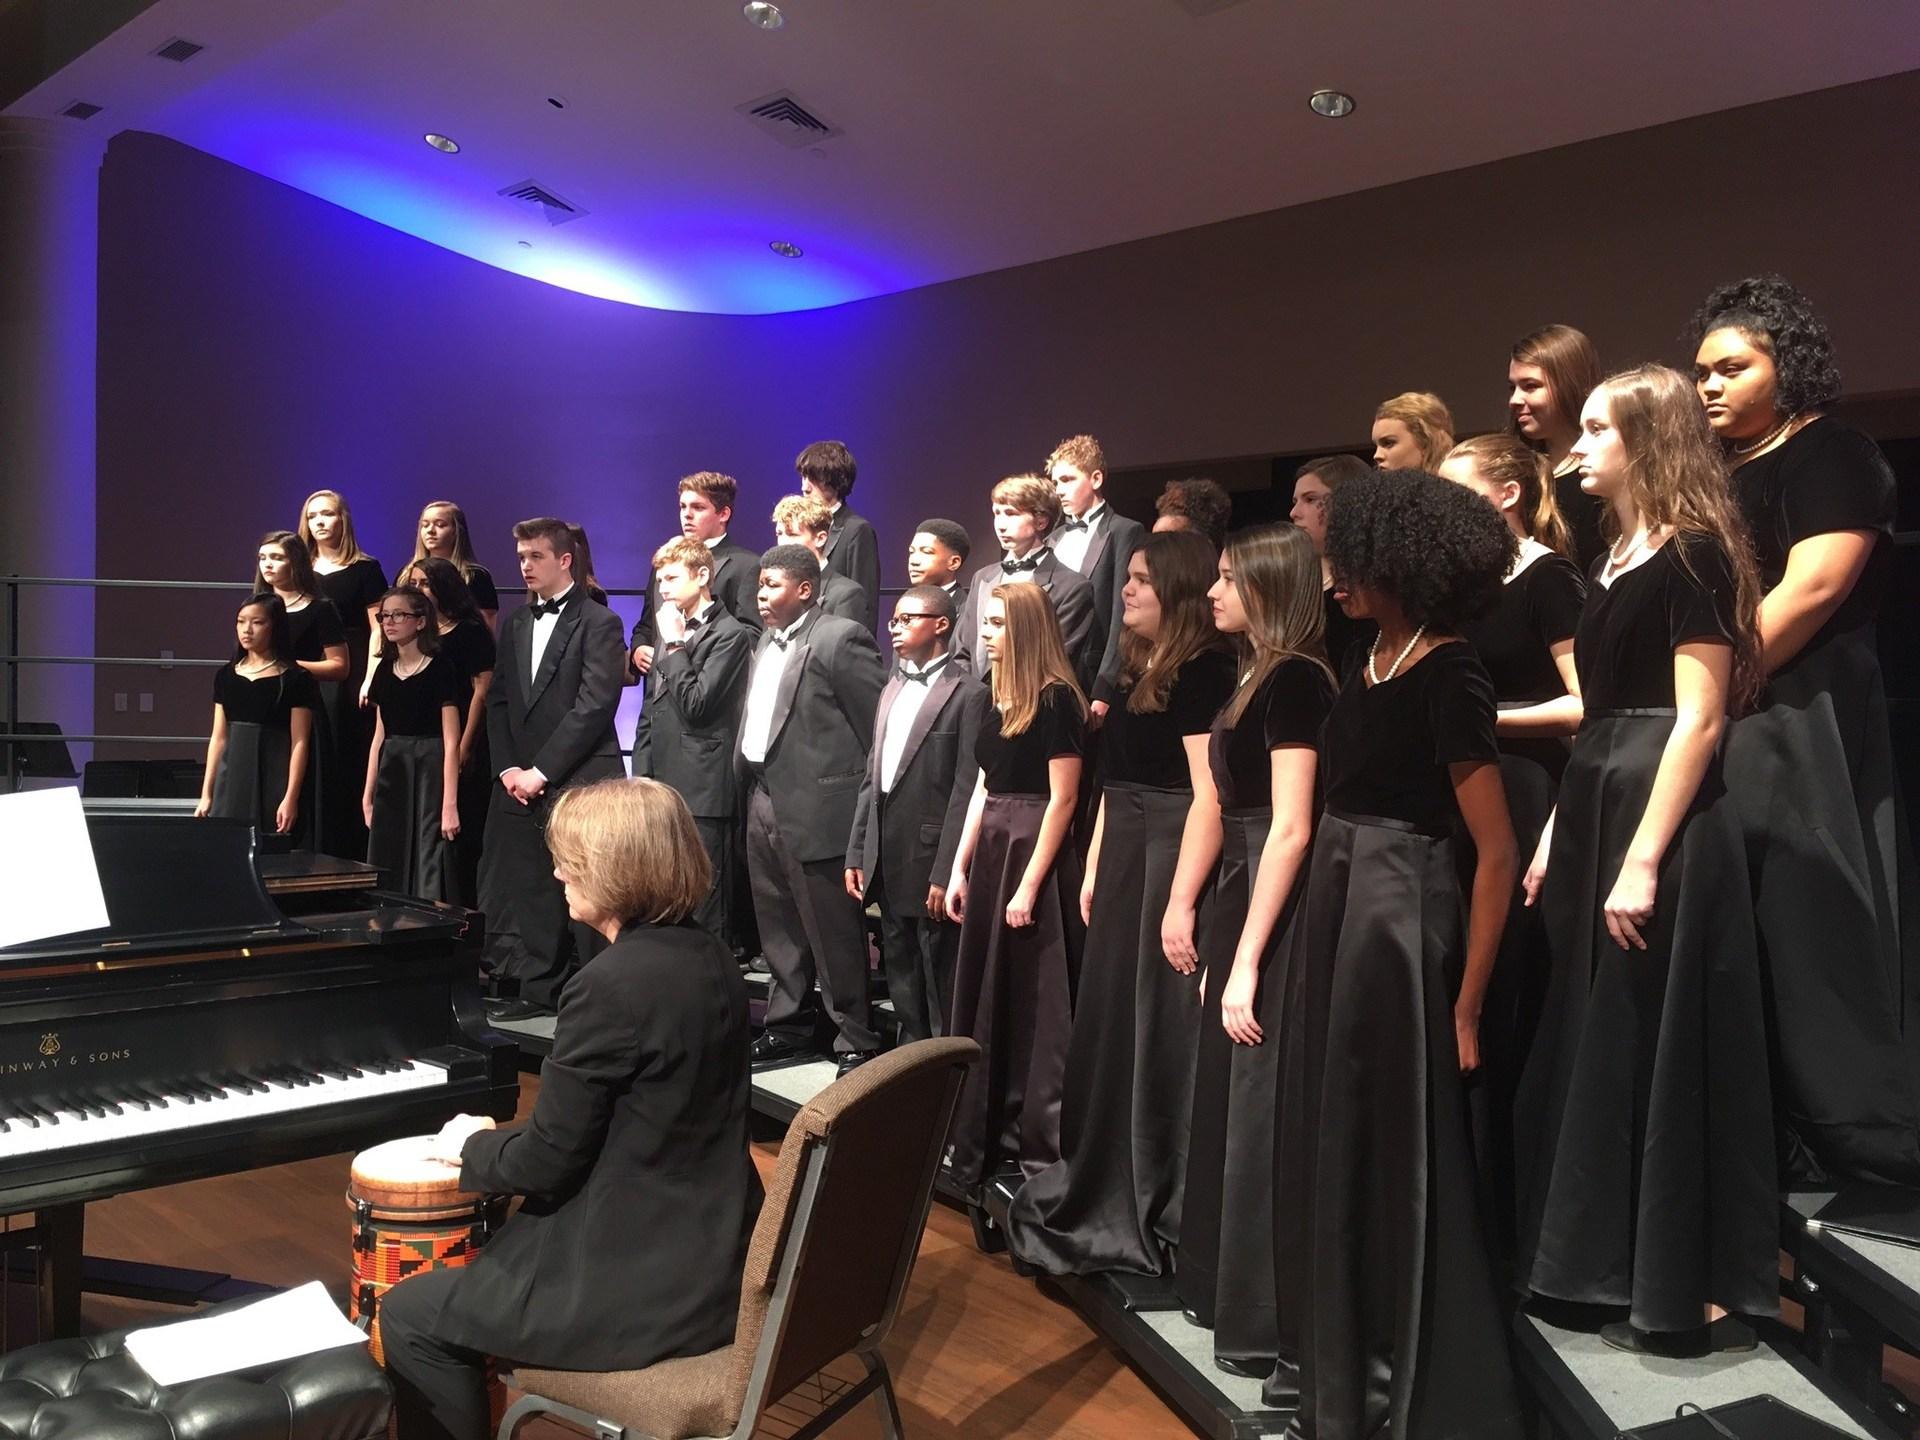 Southern Wesleyan University Choral Festival